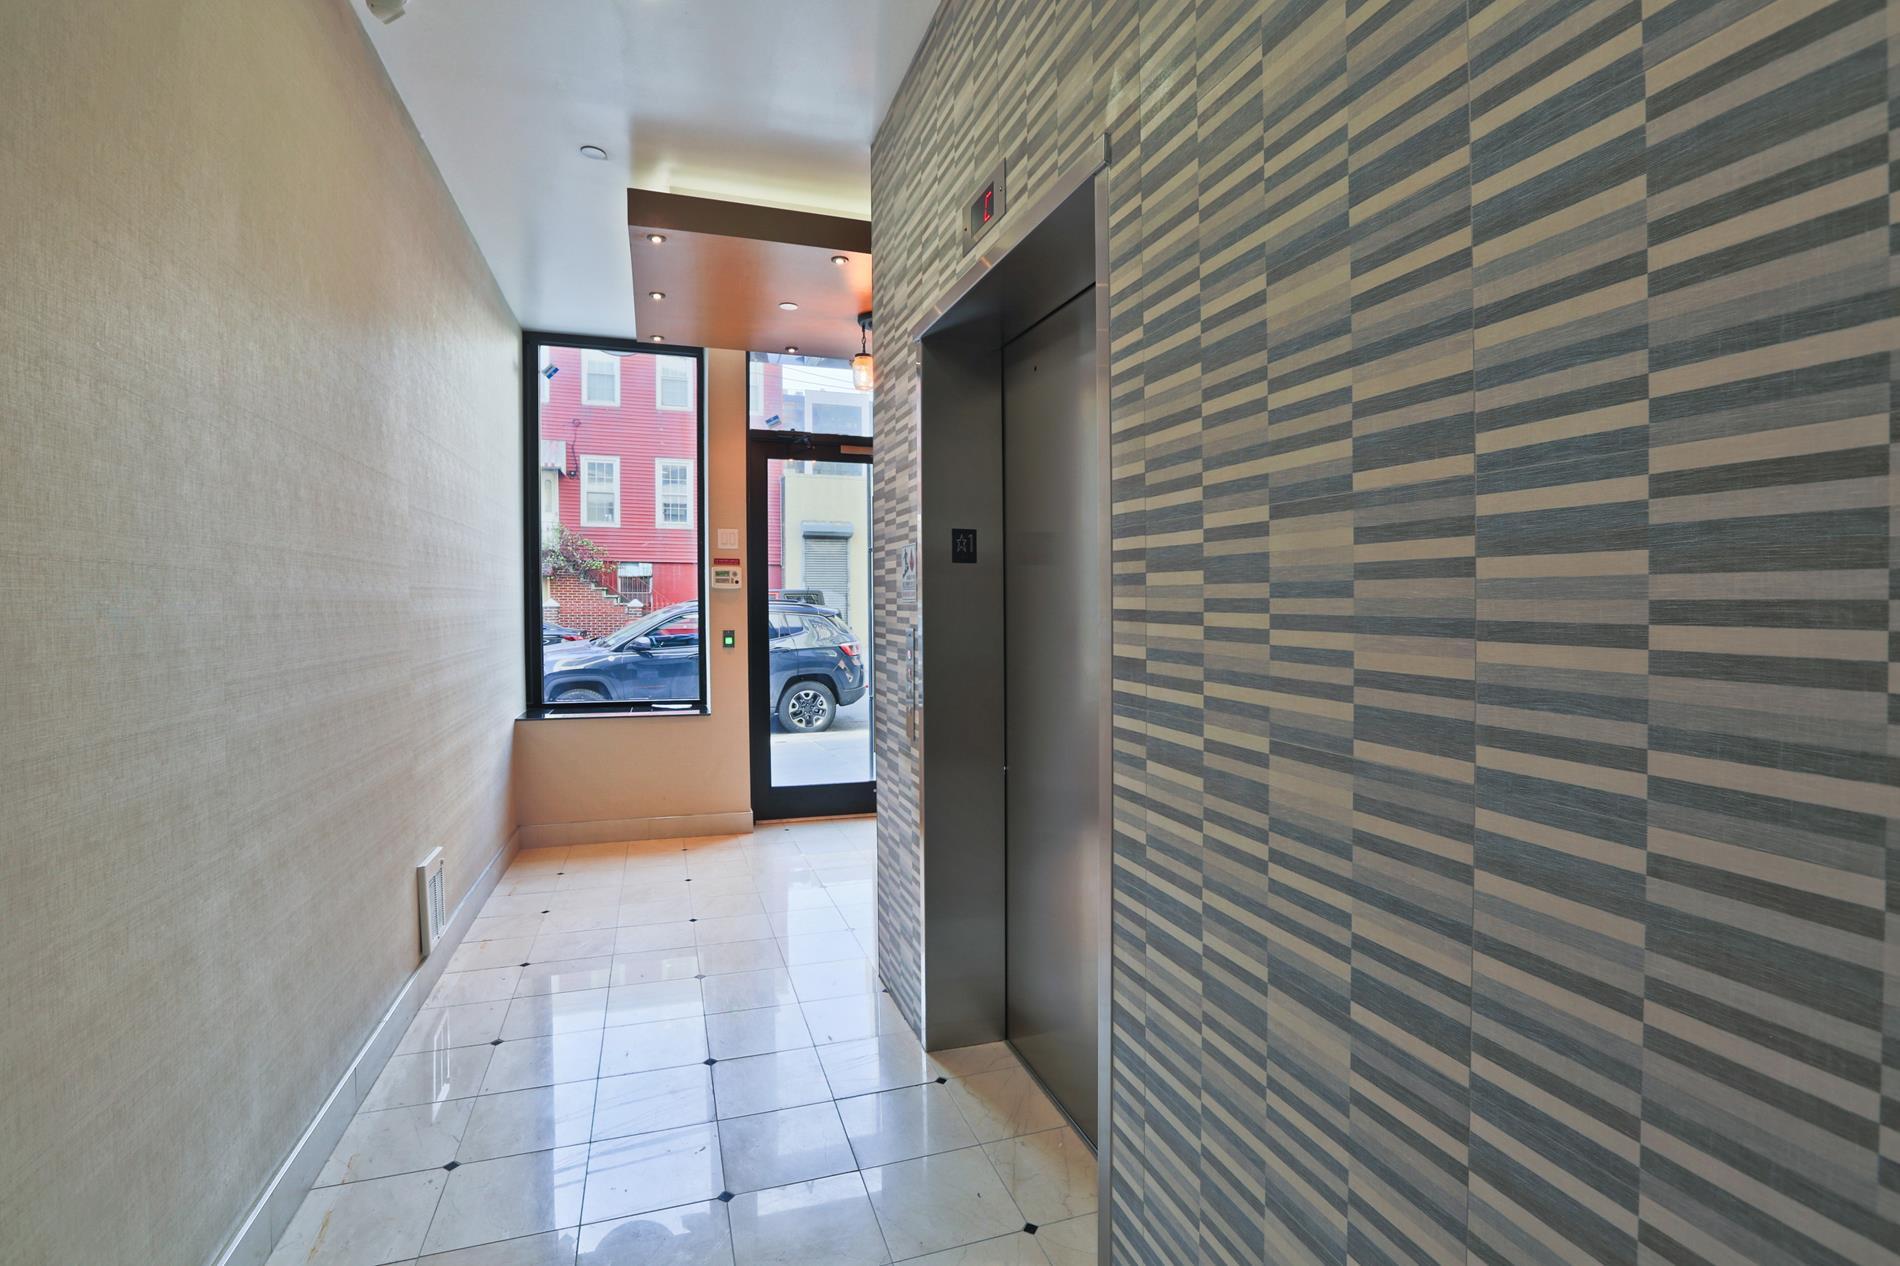 42-43 27th Street Long Island City Queens NY 11101